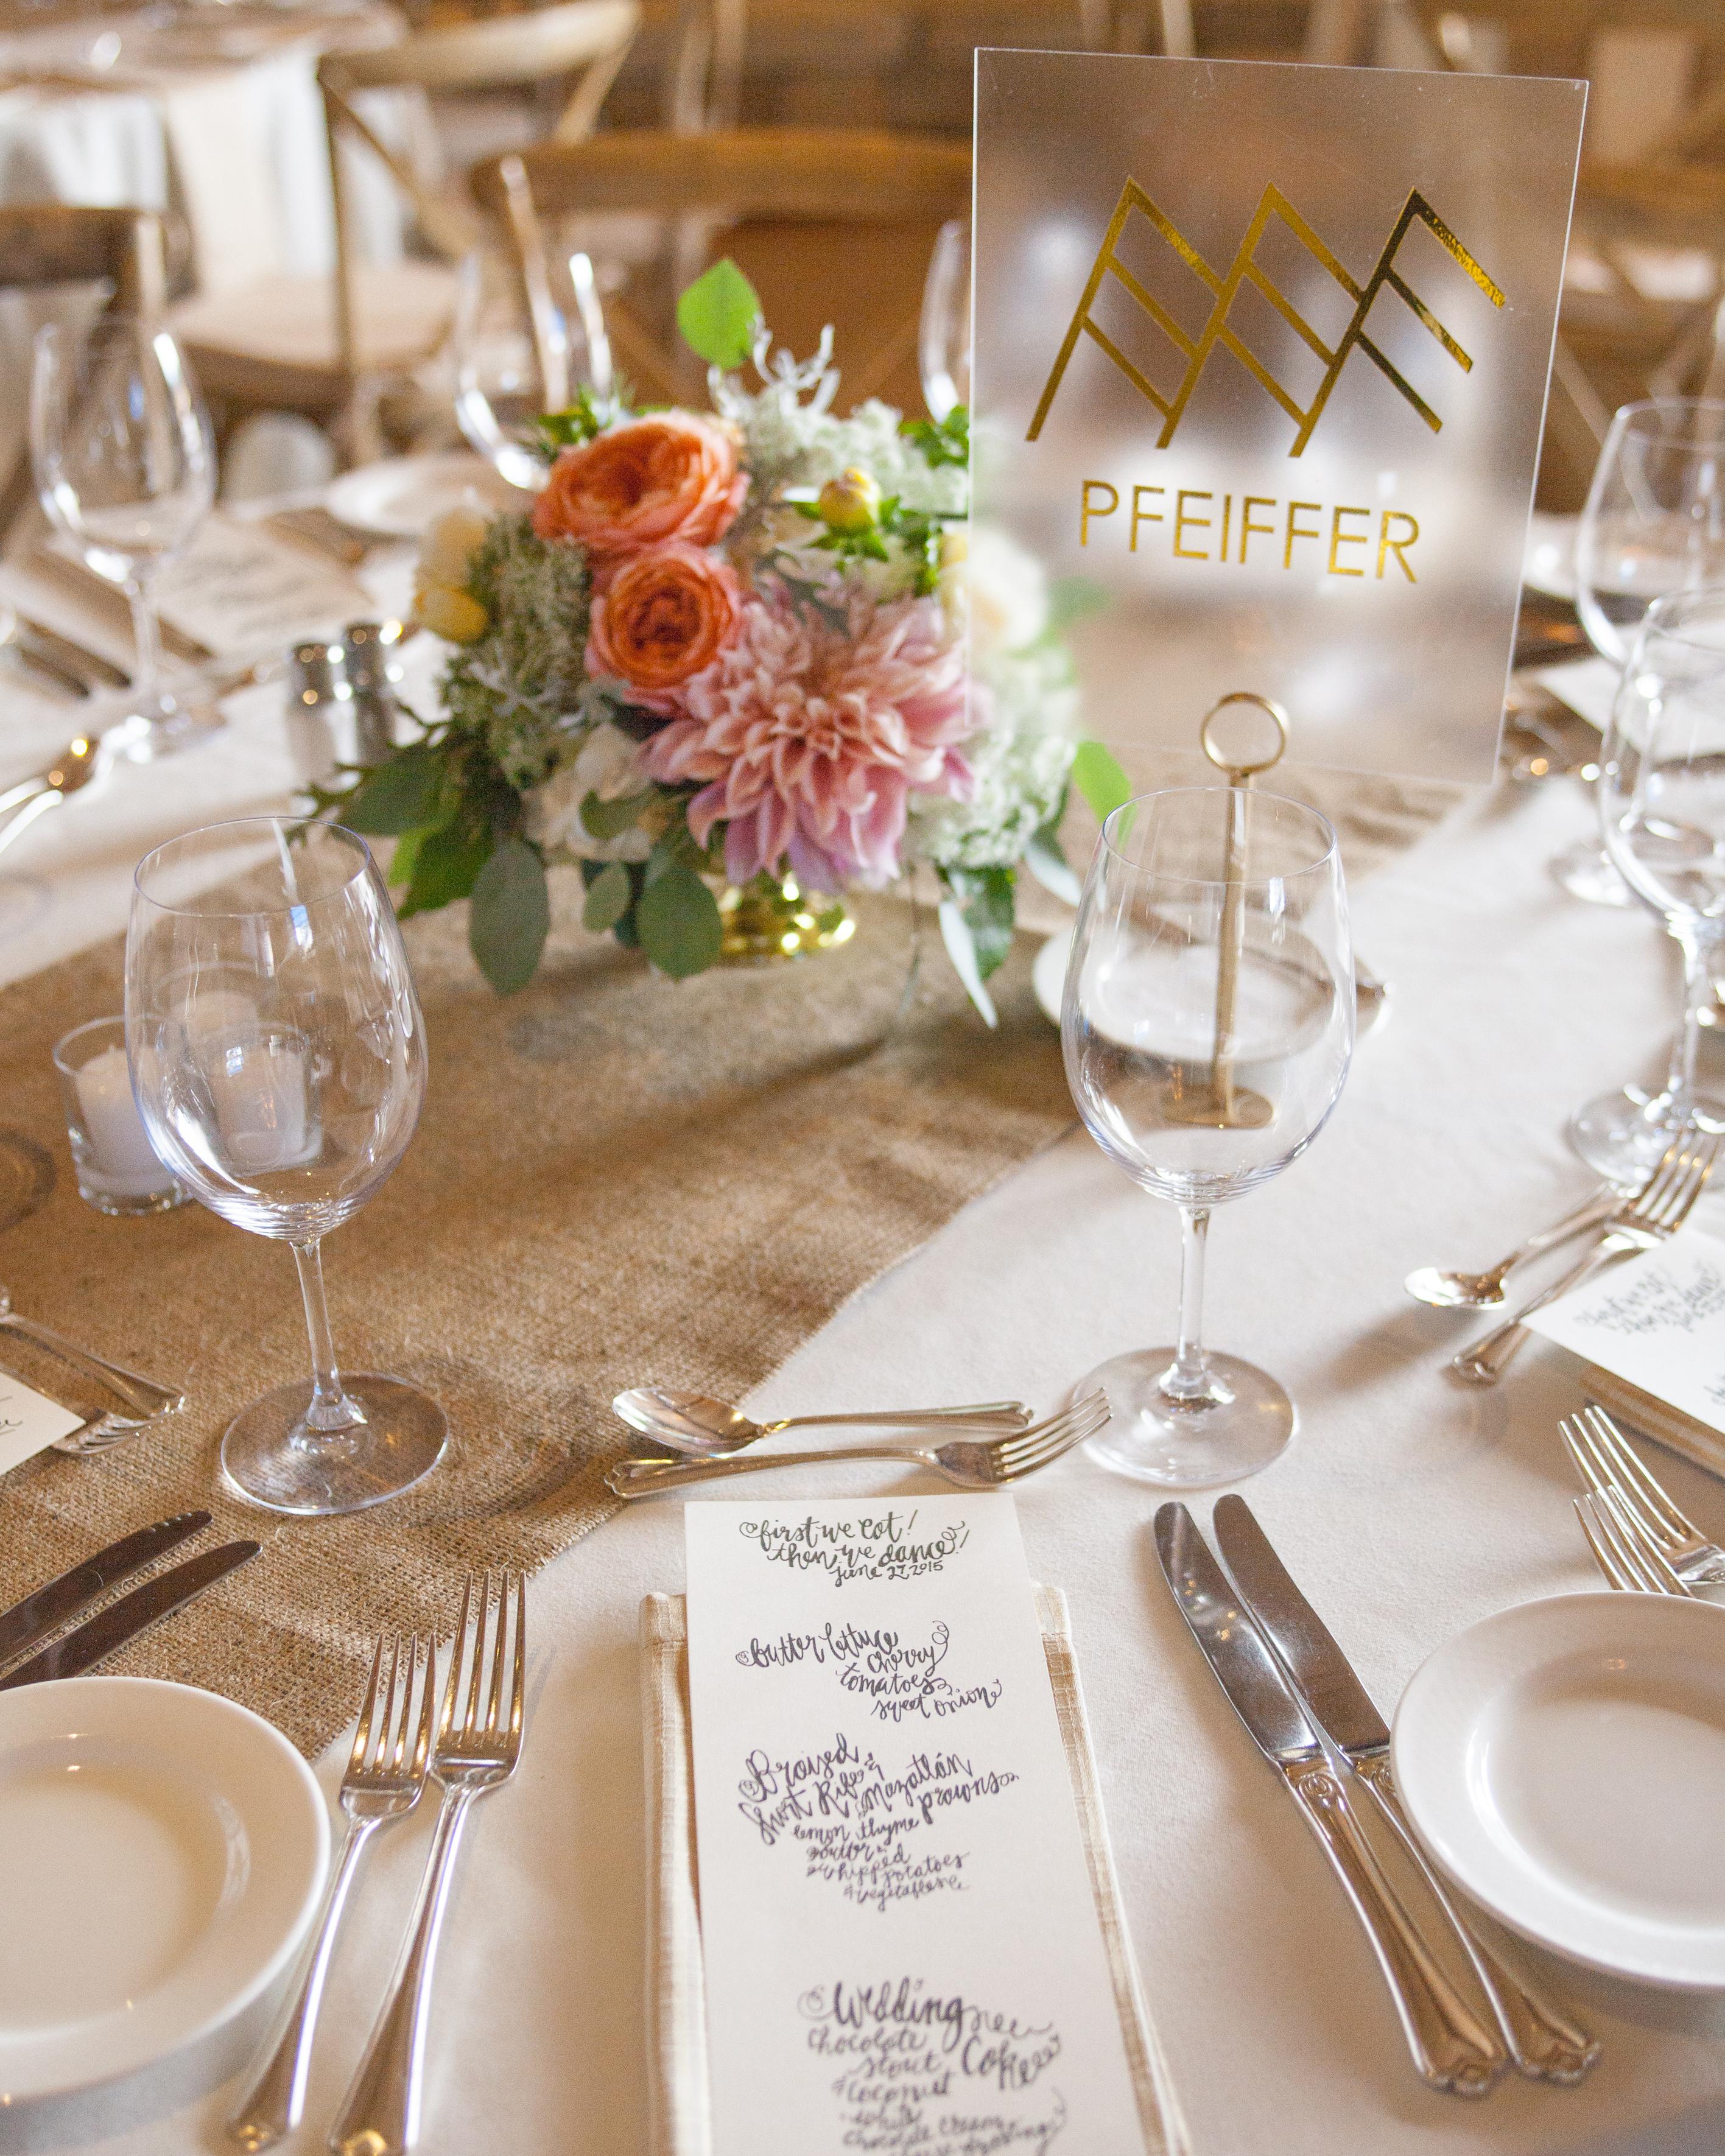 kristin-chris-wedding-table-301-s112398-0116.jpg